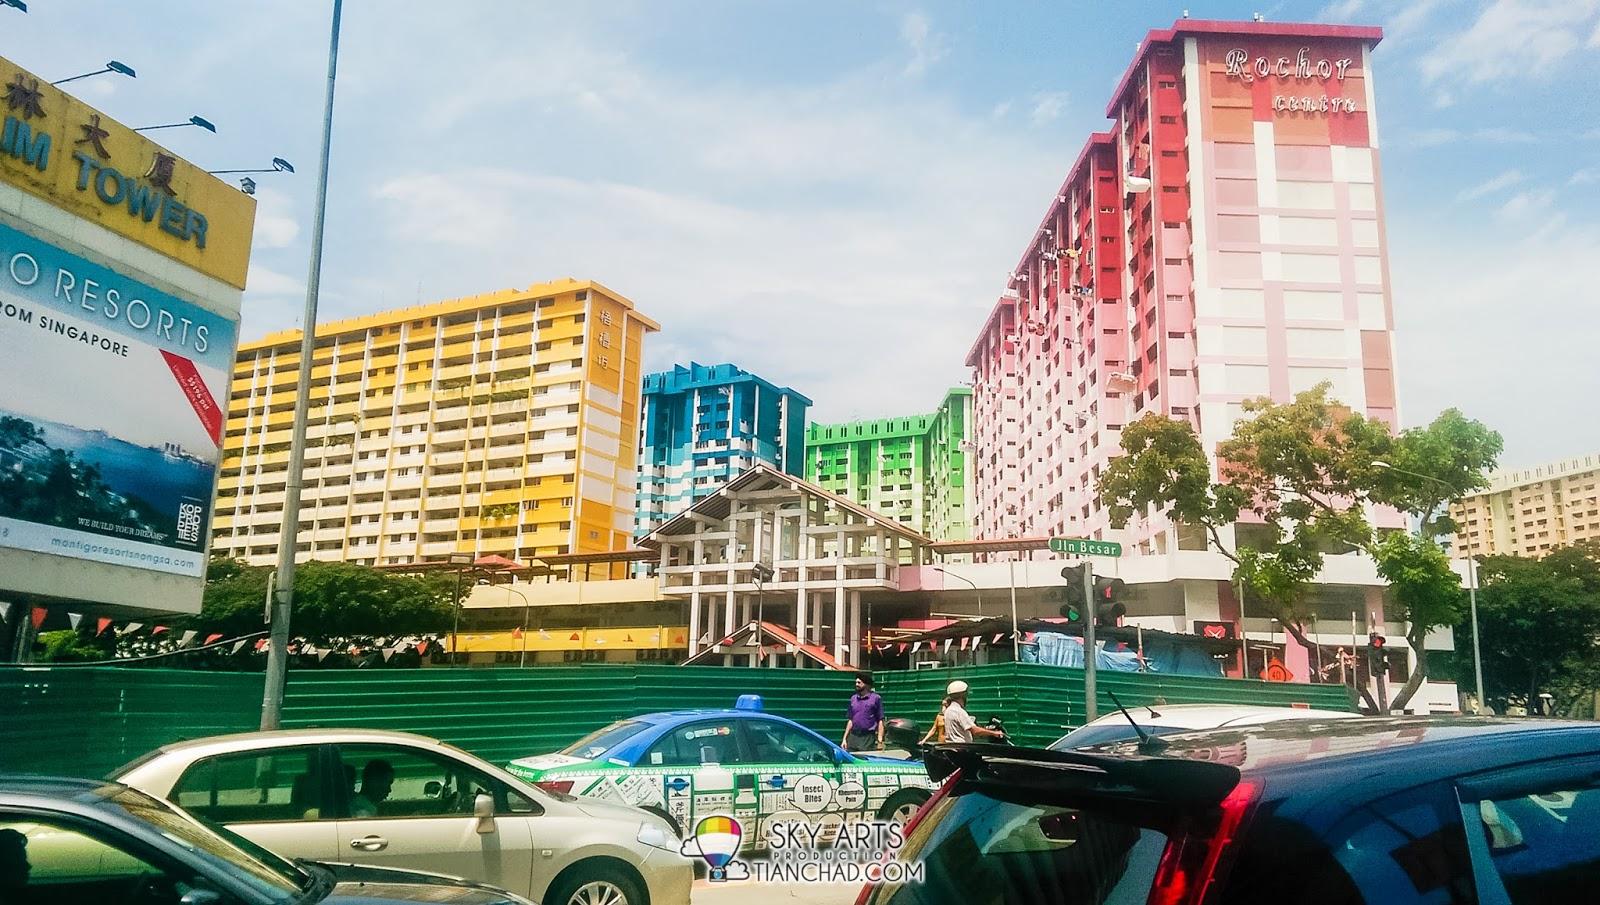 Rainbow color building near Bugis Street spotted